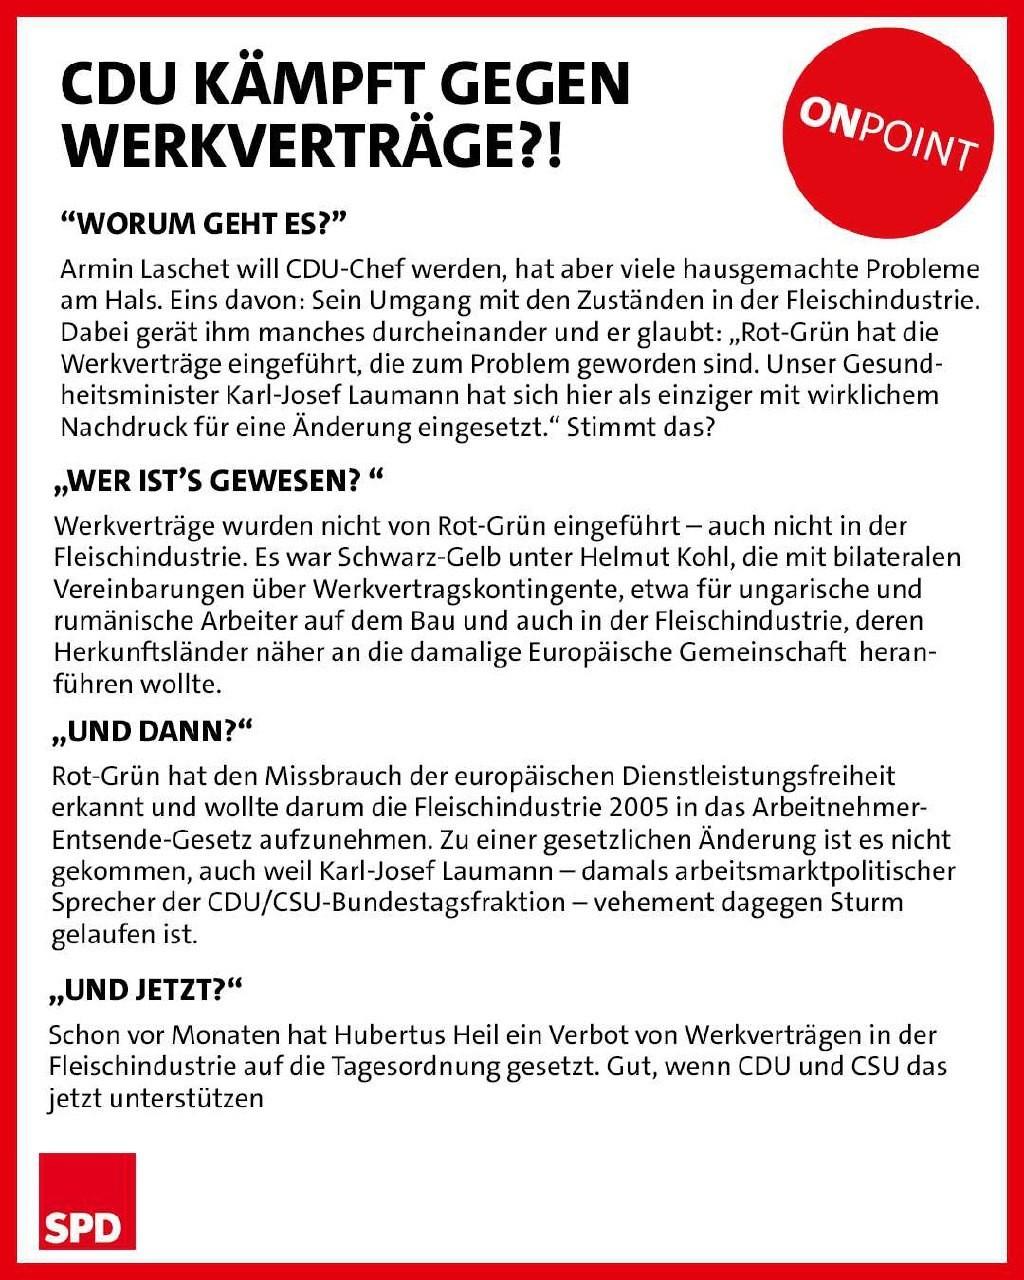 CDU kämpft gegen Werkverträge